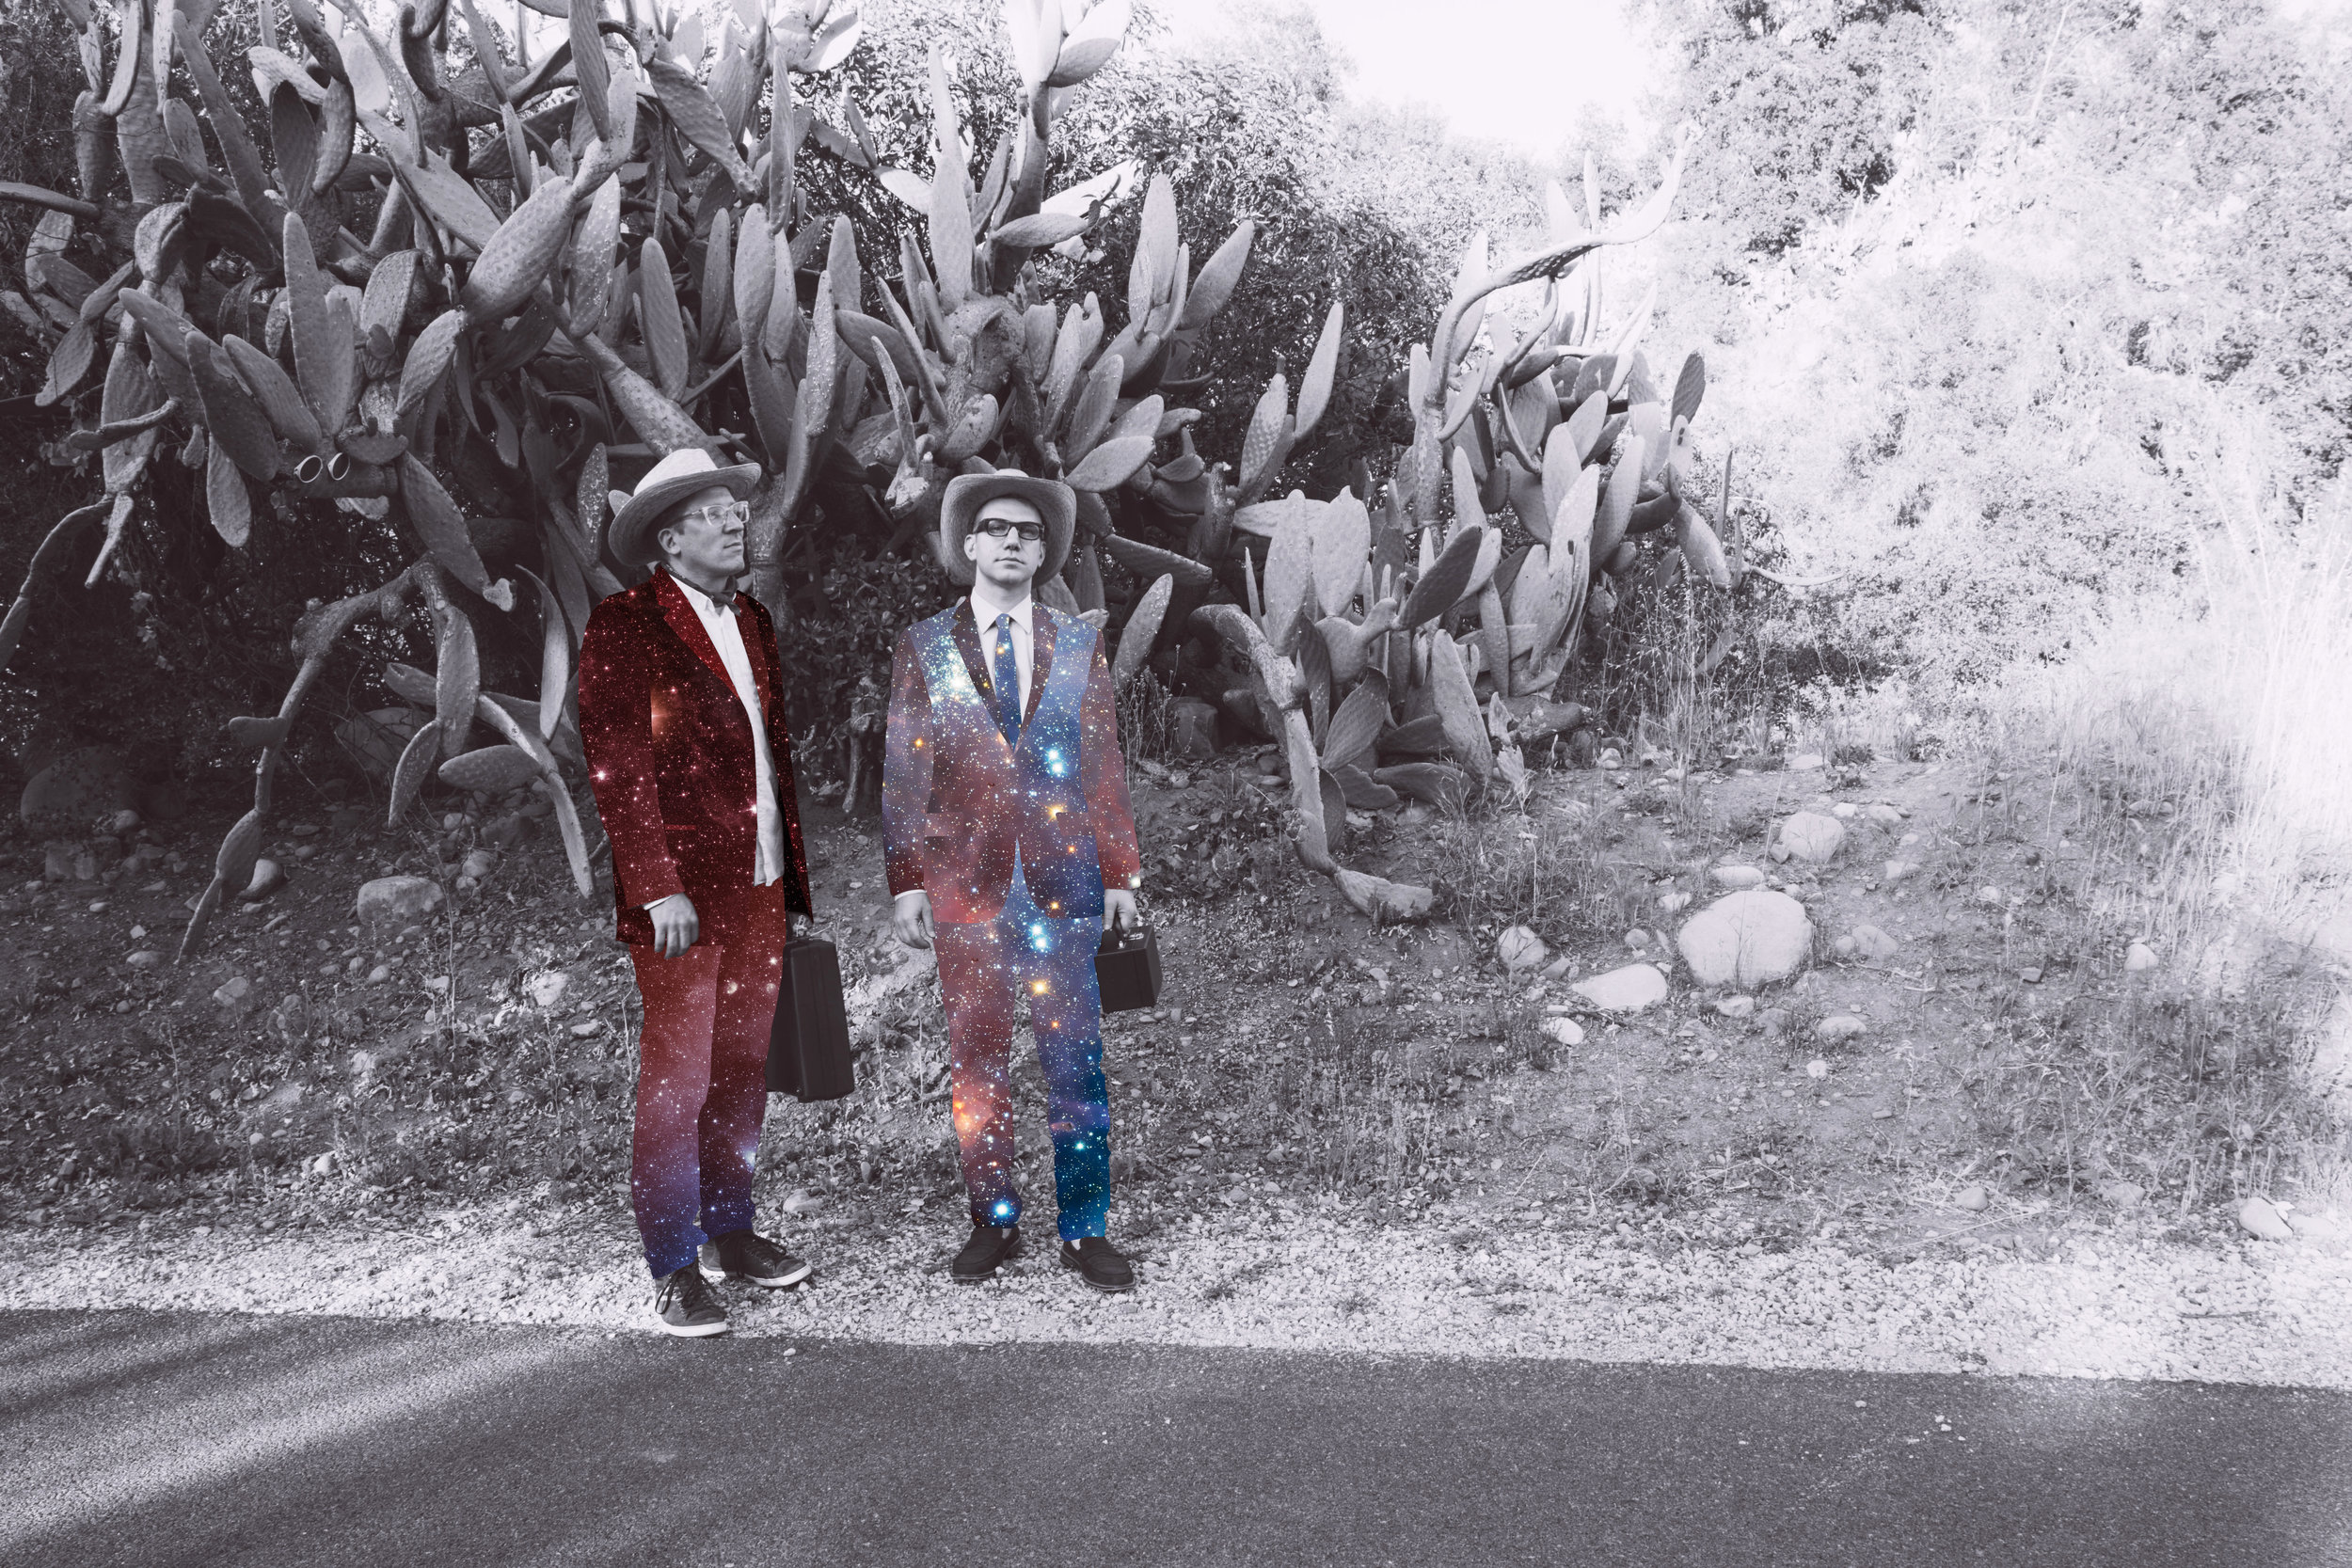 Quindar: Mikael Jorgensen & James Merle Thomas.  Photo by  Chad Ress , Spacesuits by  Cassandra C. Jones